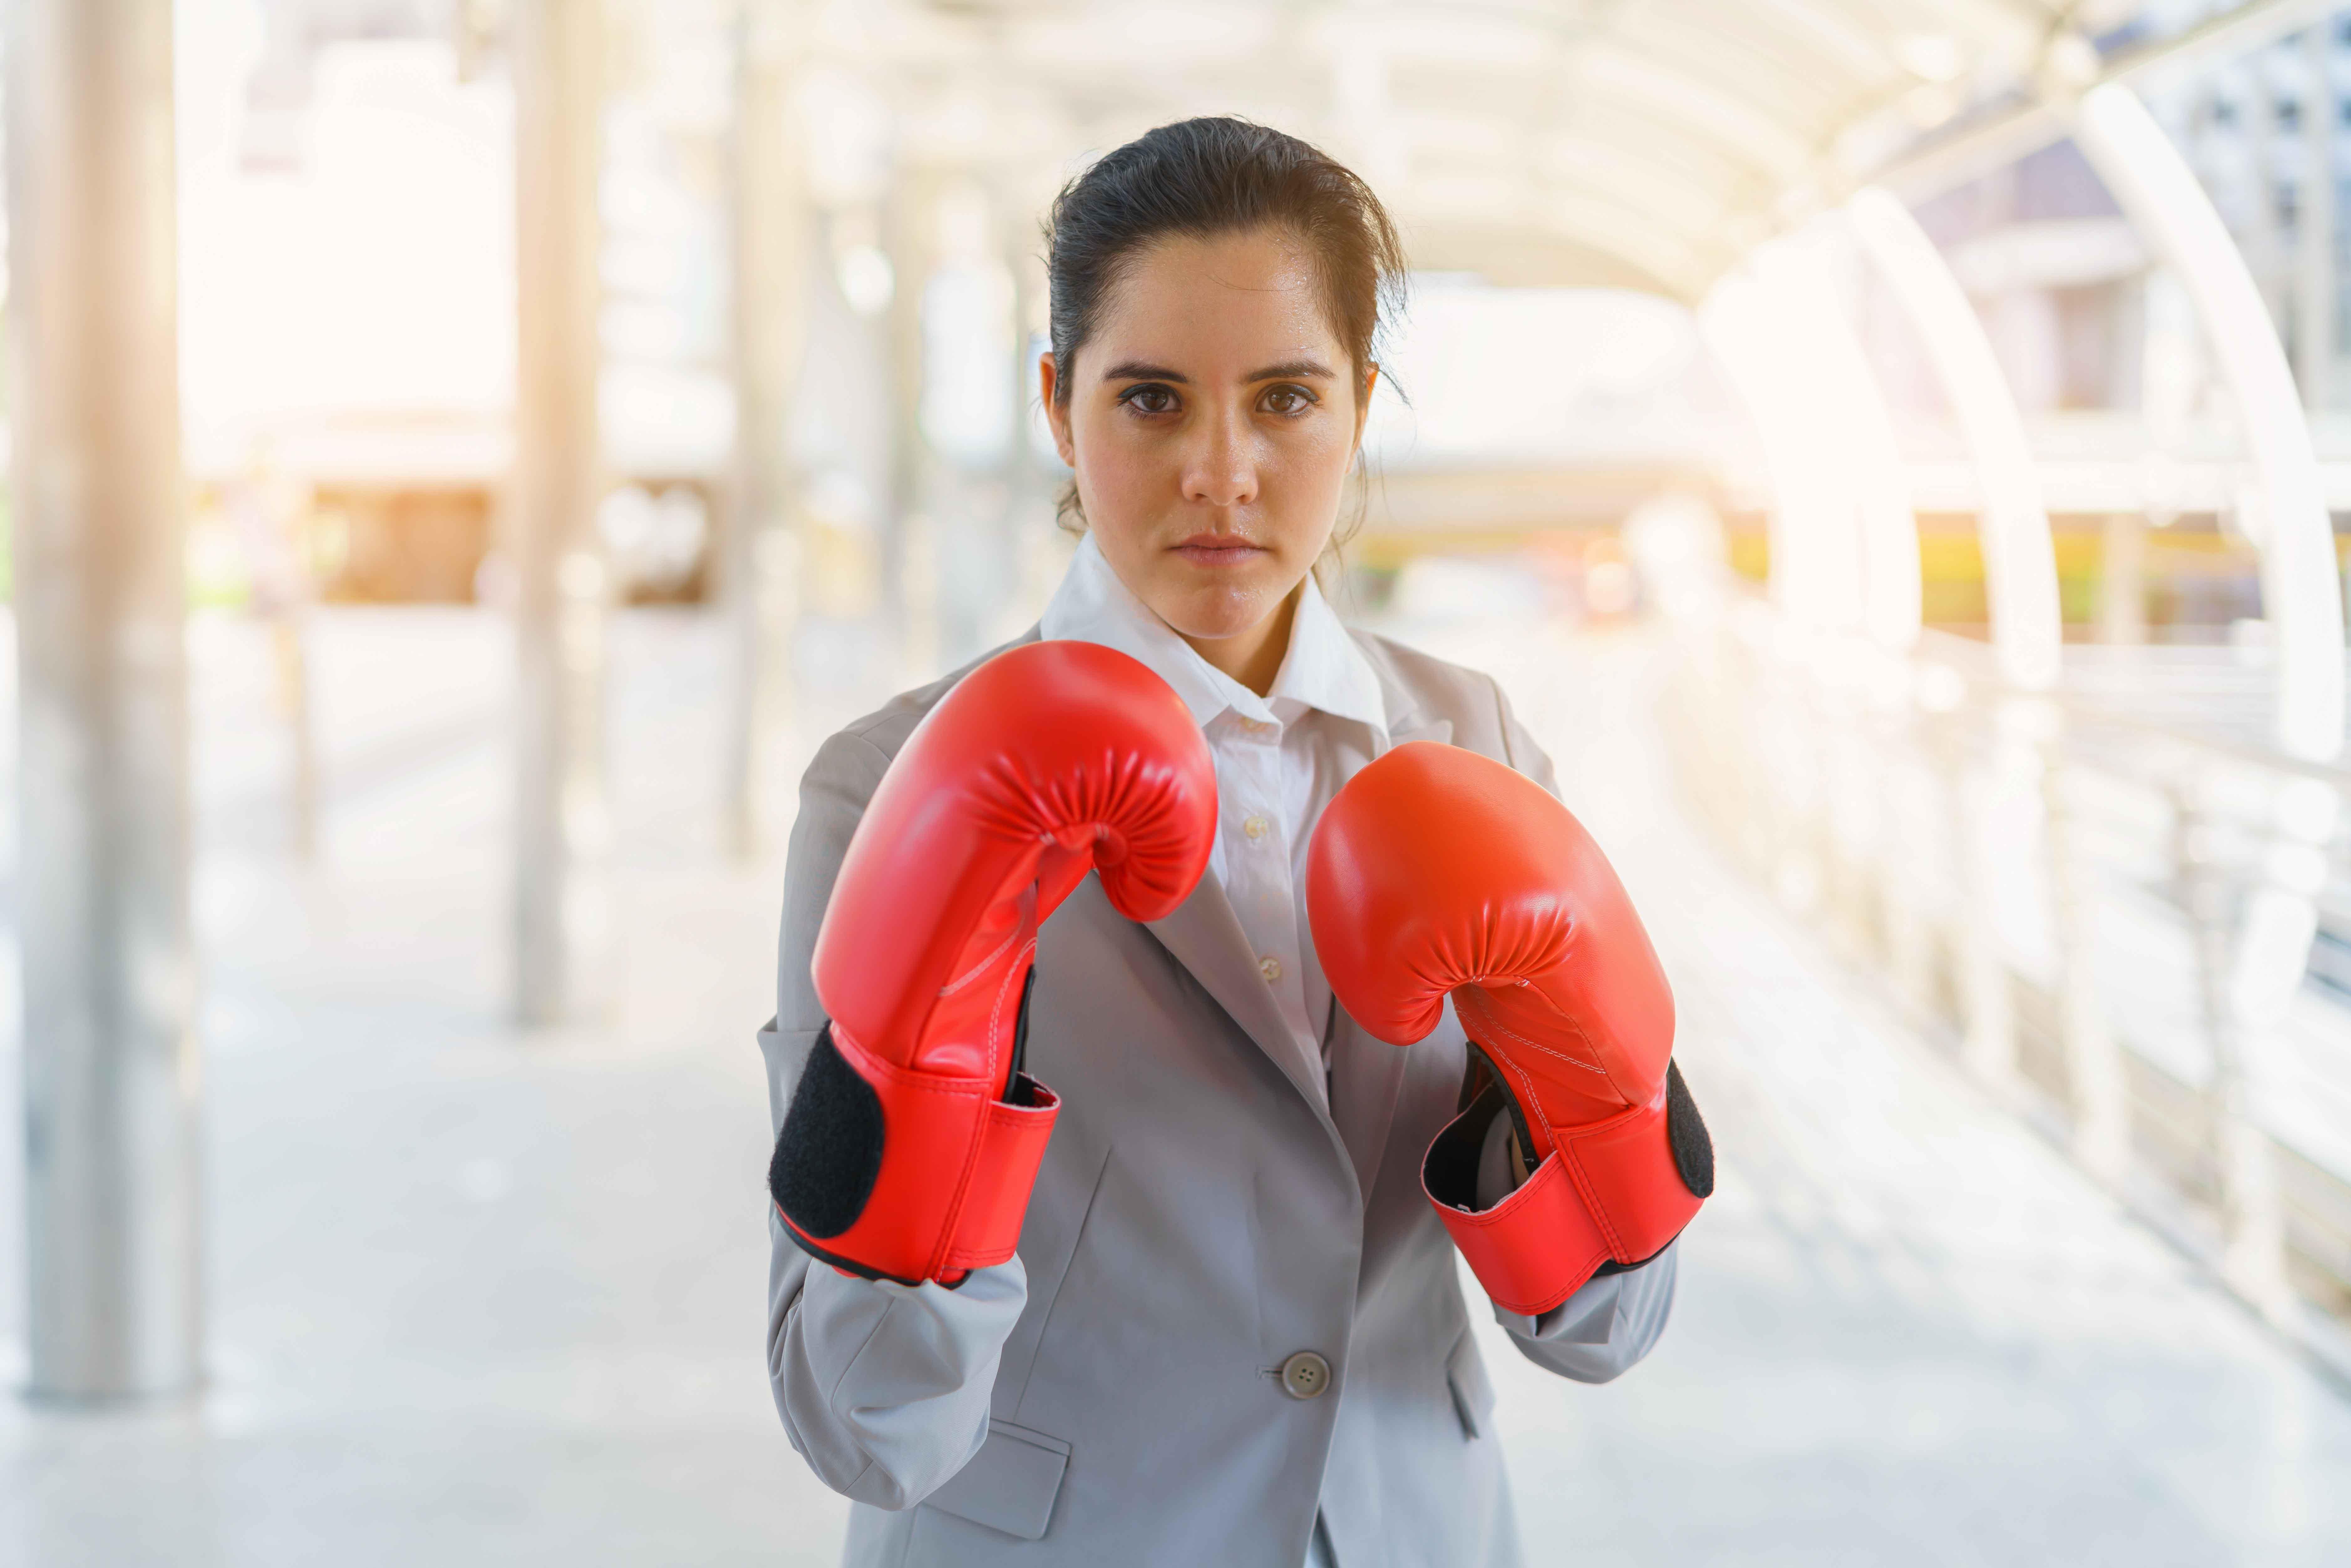 Ejecutiva con guantes de boxeo